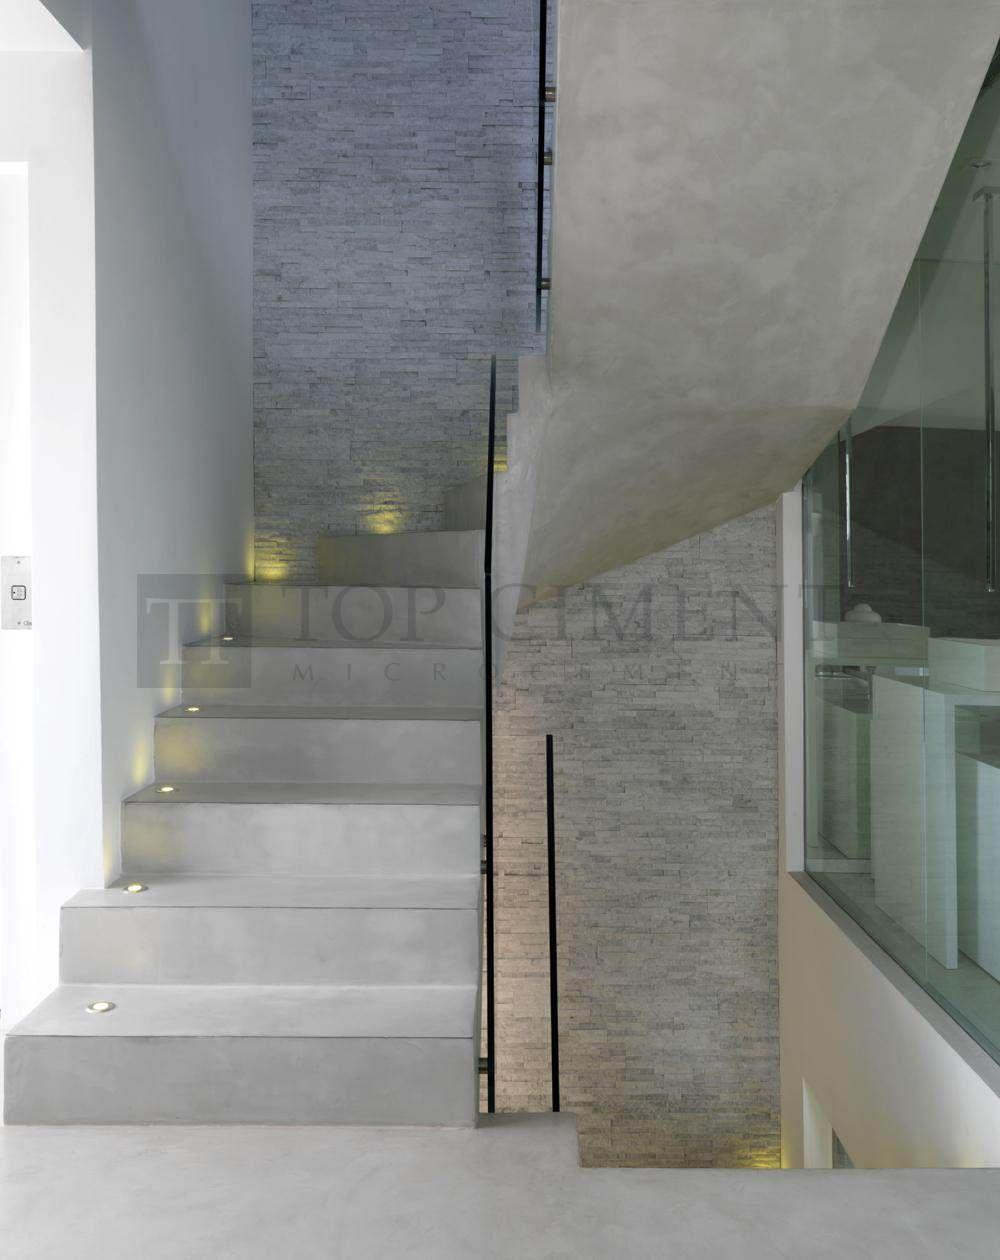 Escalera gris de diseo revestida con microcemento con